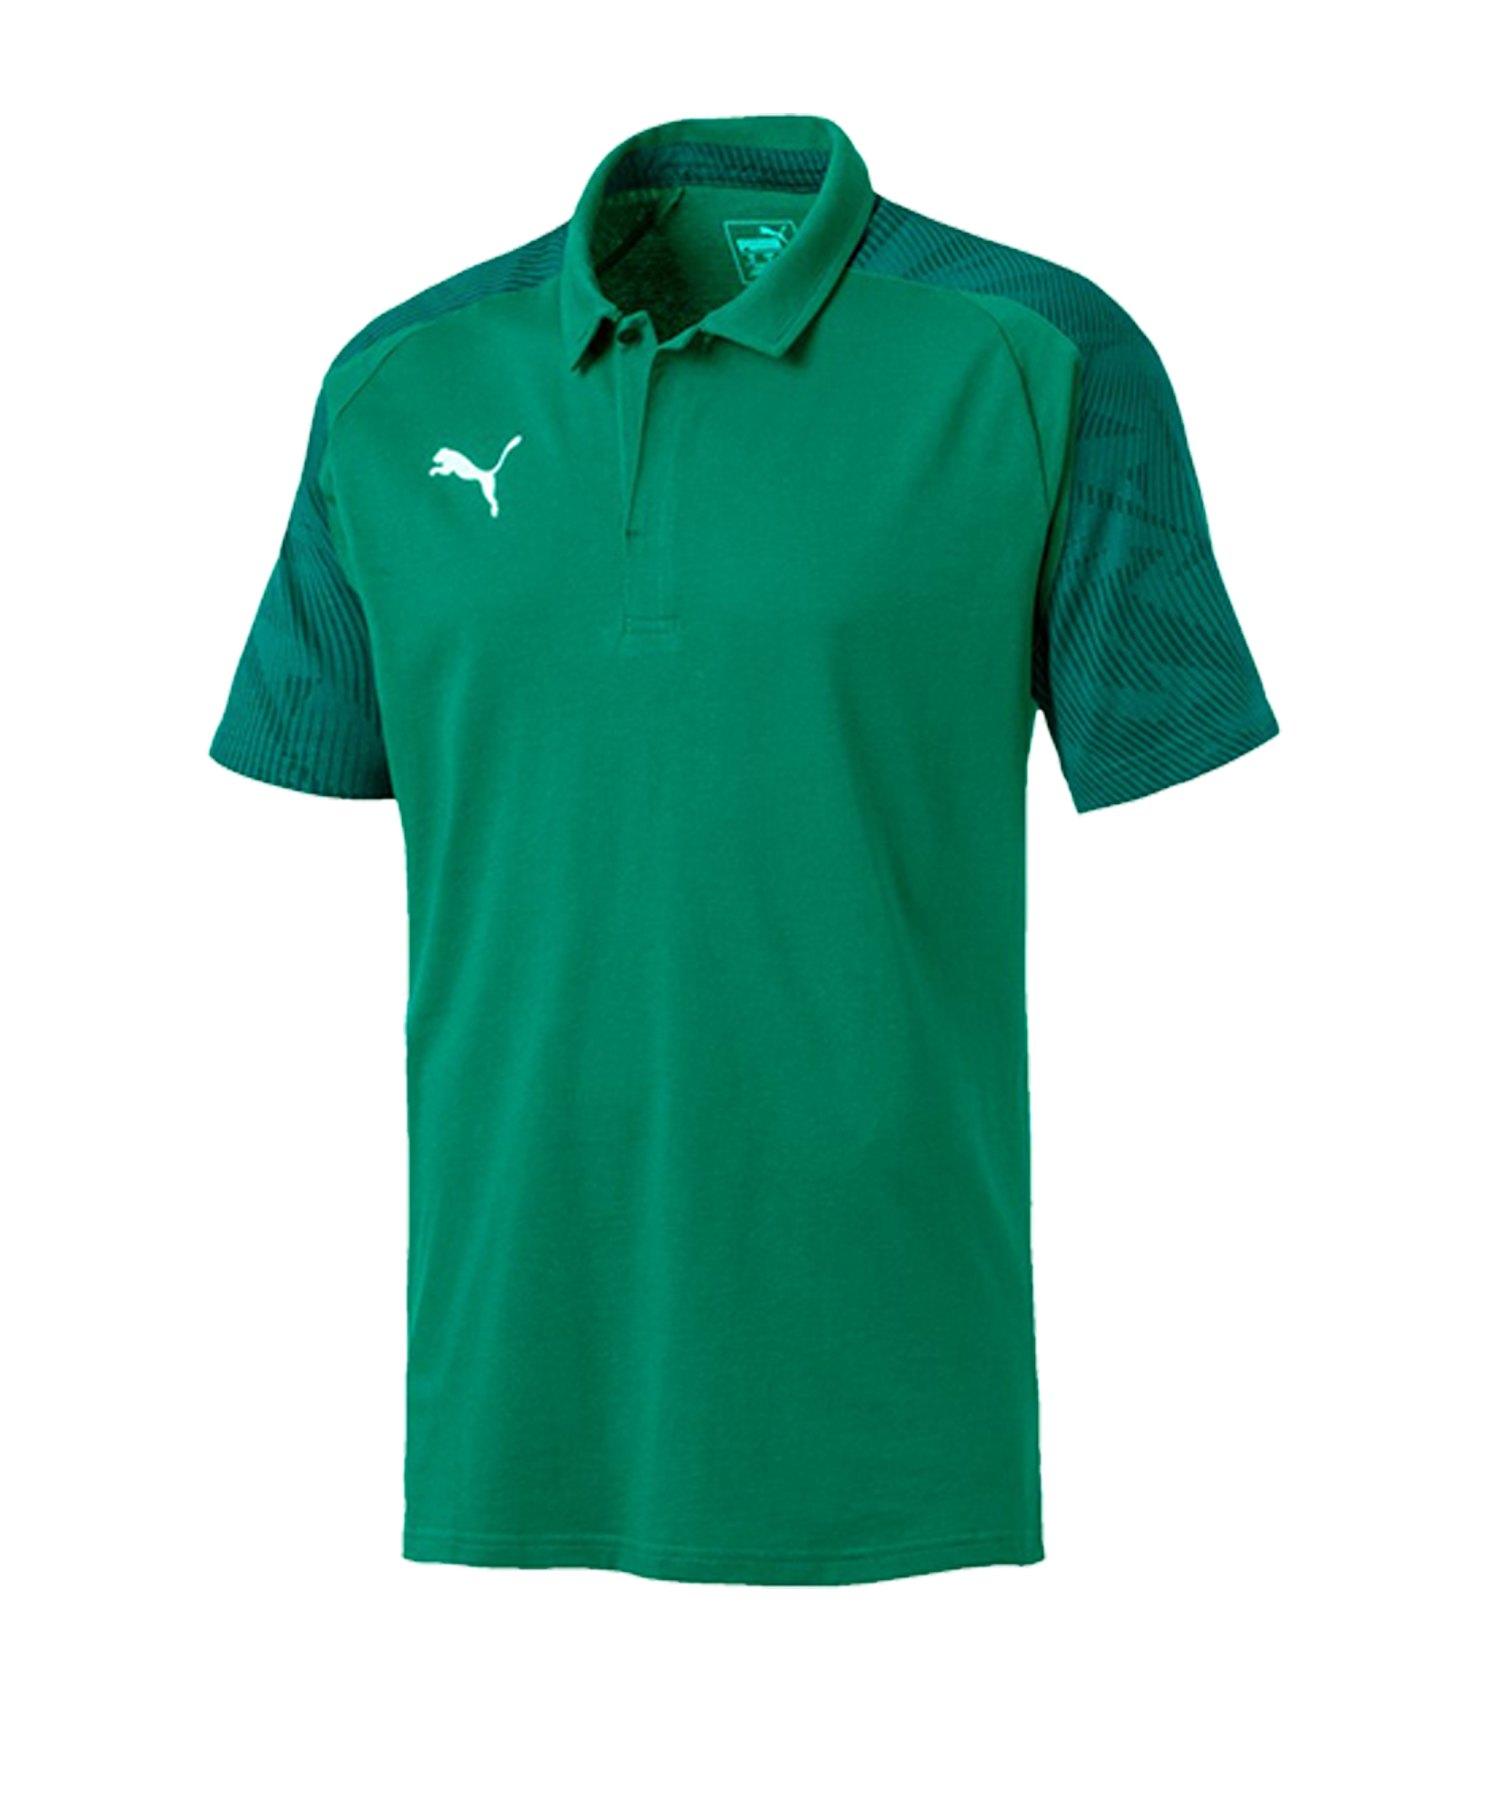 PUMA CUP Sideline Poloshirt Grün F05 - gruen